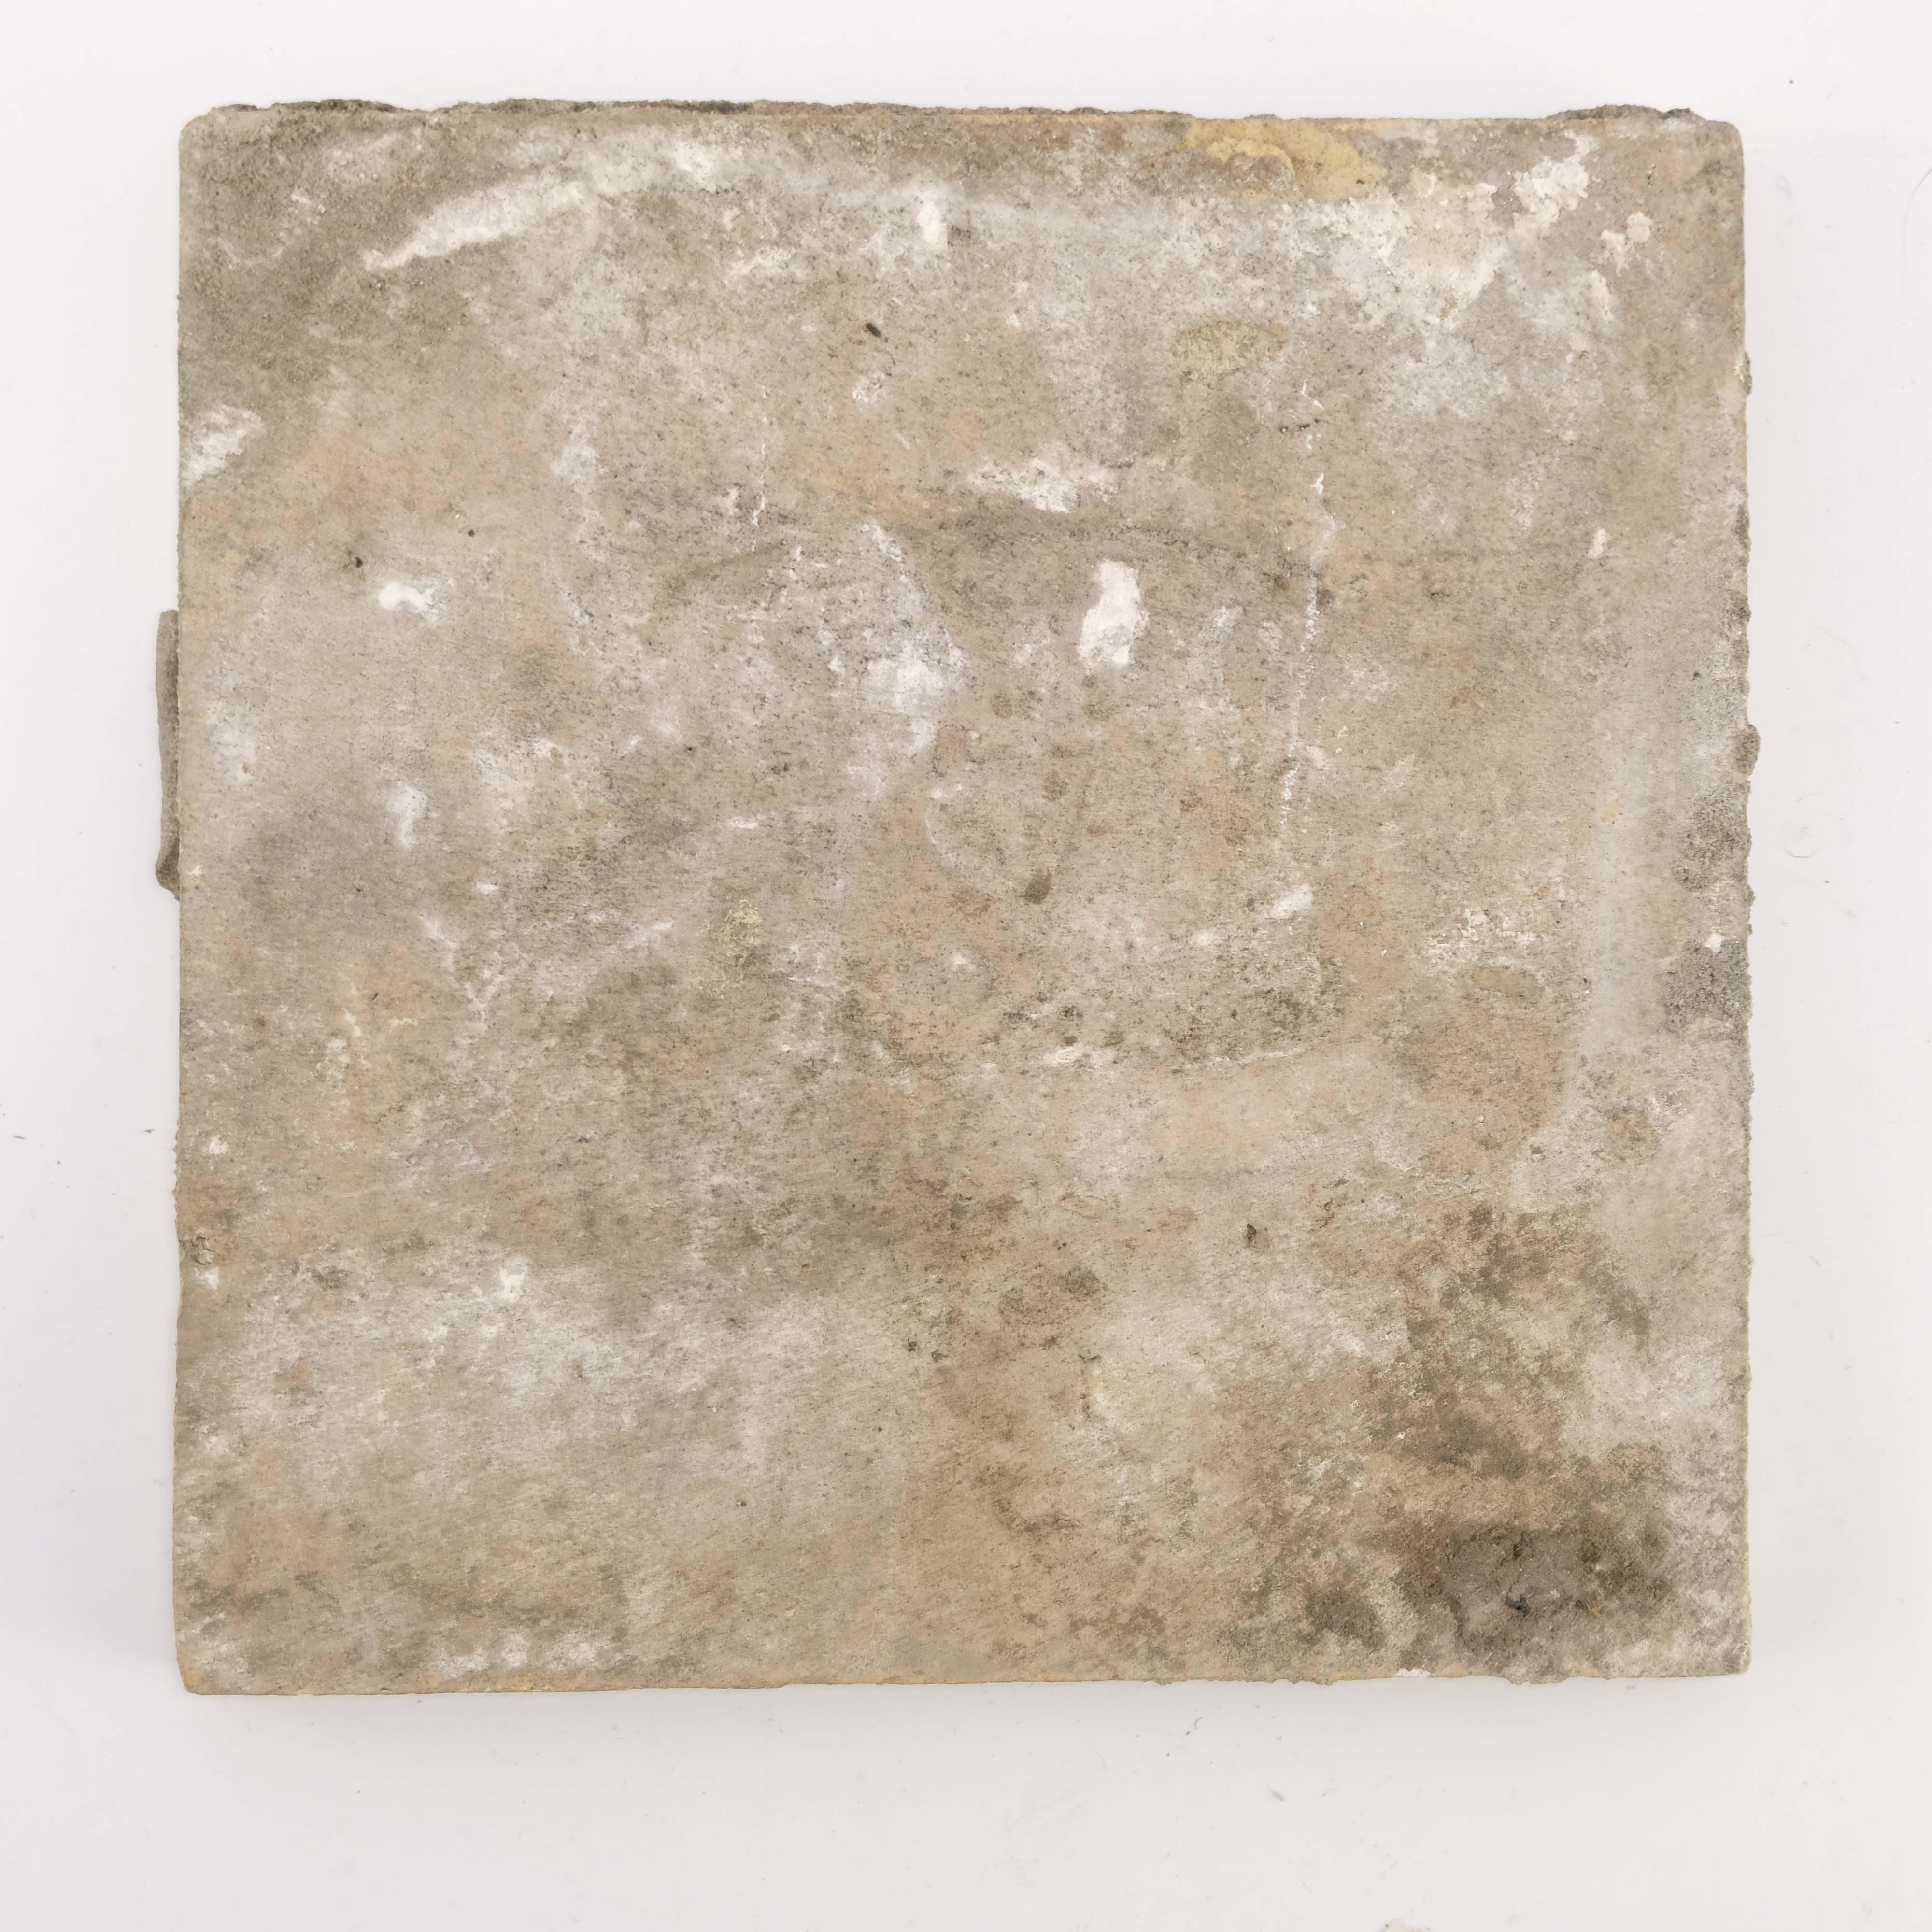 William De Morgan, a Bedford Park Anemone tile - Image 2 of 2